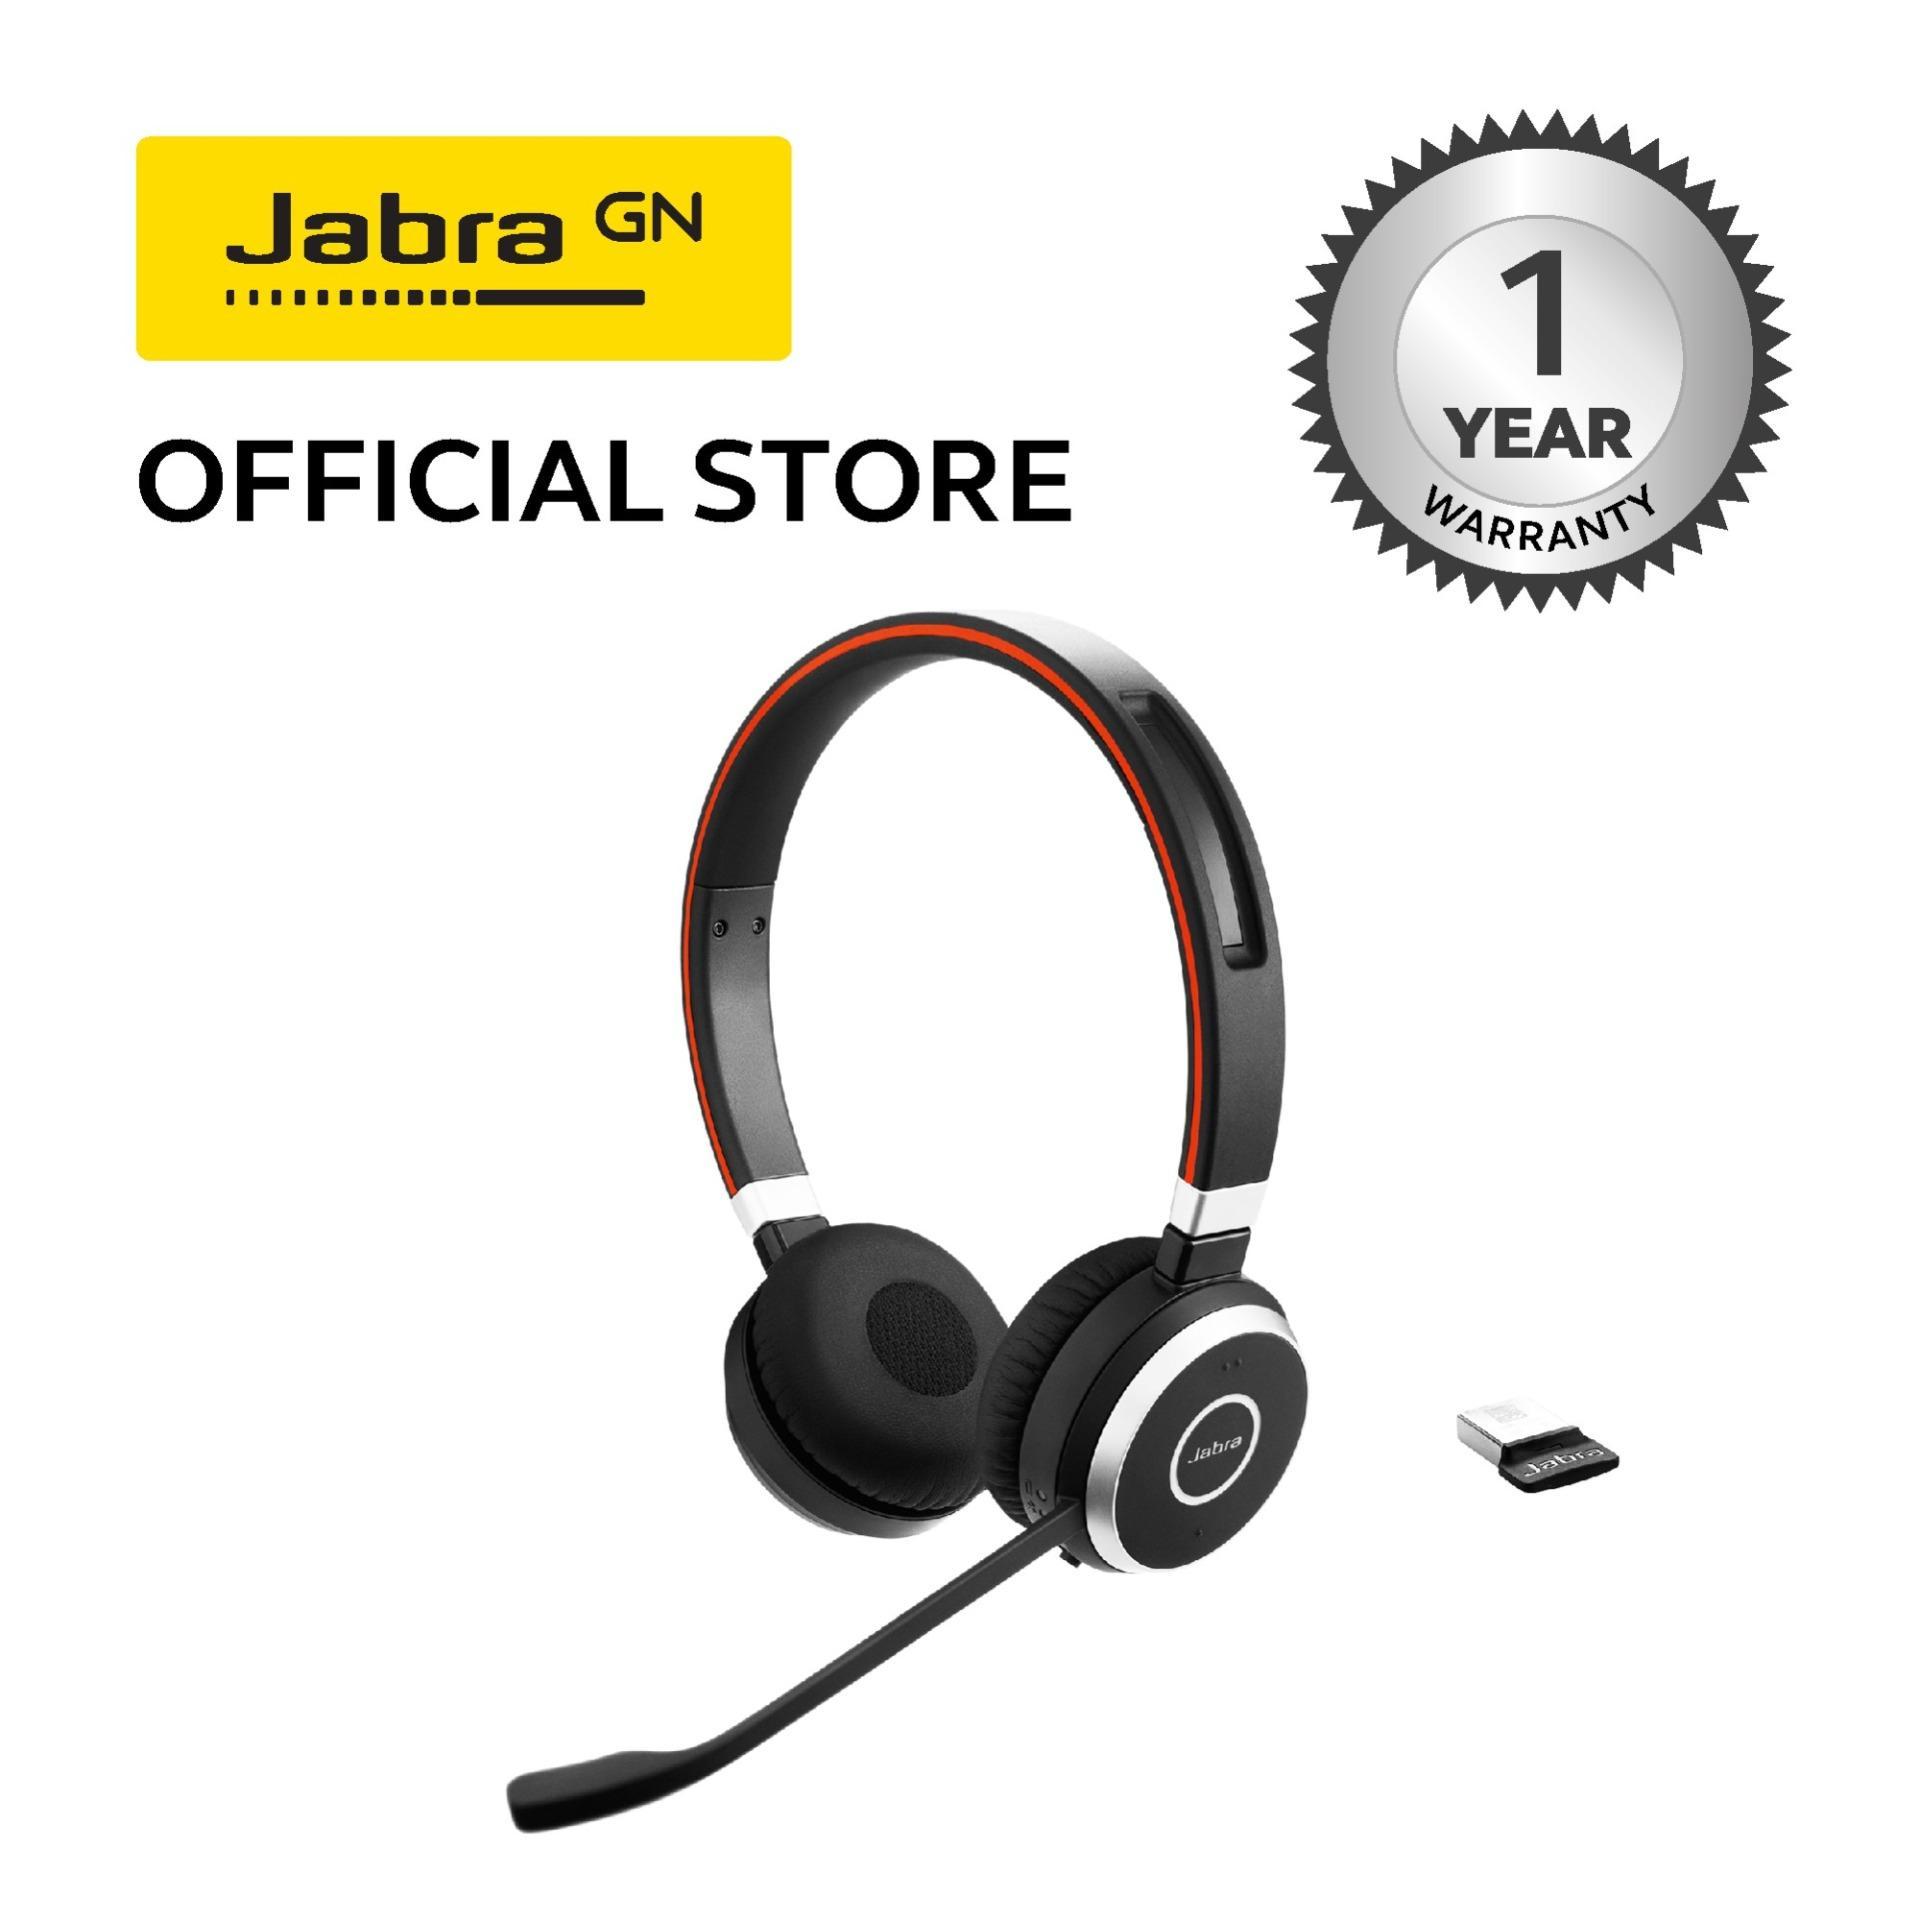 Jabra Buy Jabra At Best Price In Philippines Www Lazada Com Ph